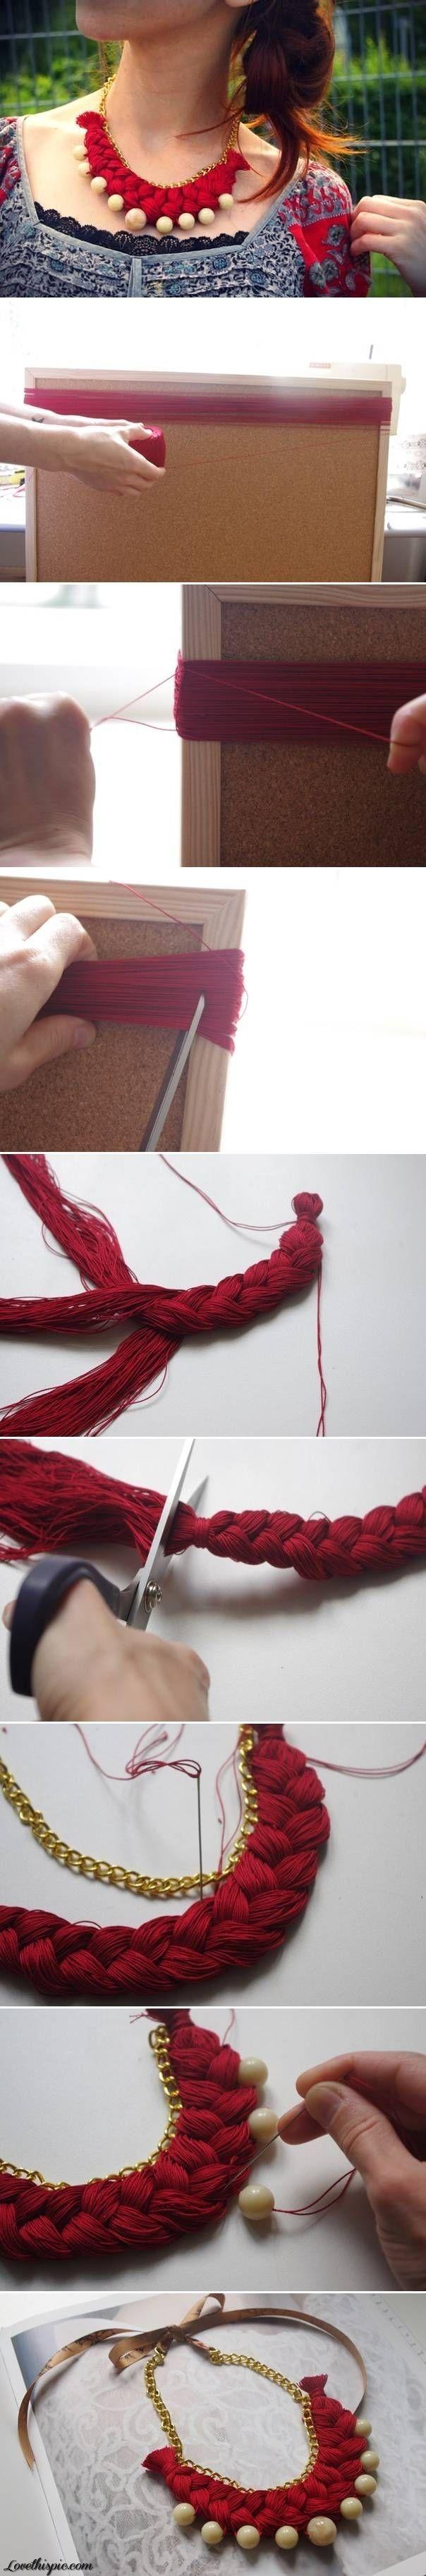 DIY Braided Necklace diy crafts craft ideas easy crafts diy ideas crafty easy diy diy bracelet craft necklace diy necklace jewelry diy